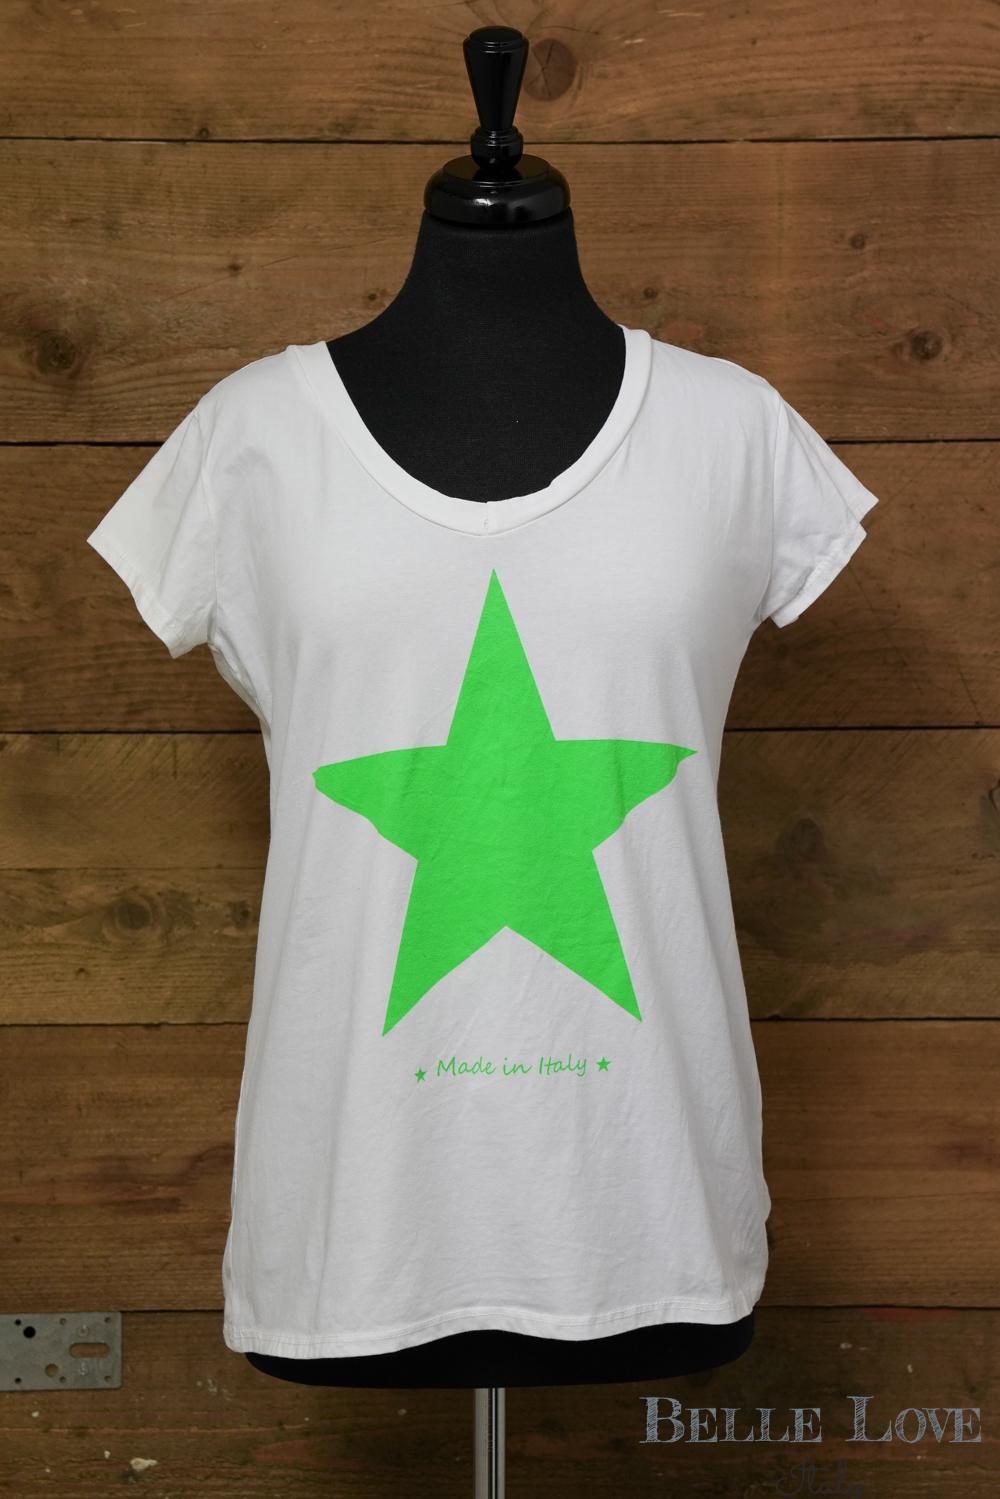 Belle Love Italy Neon Star Print T-Shirt